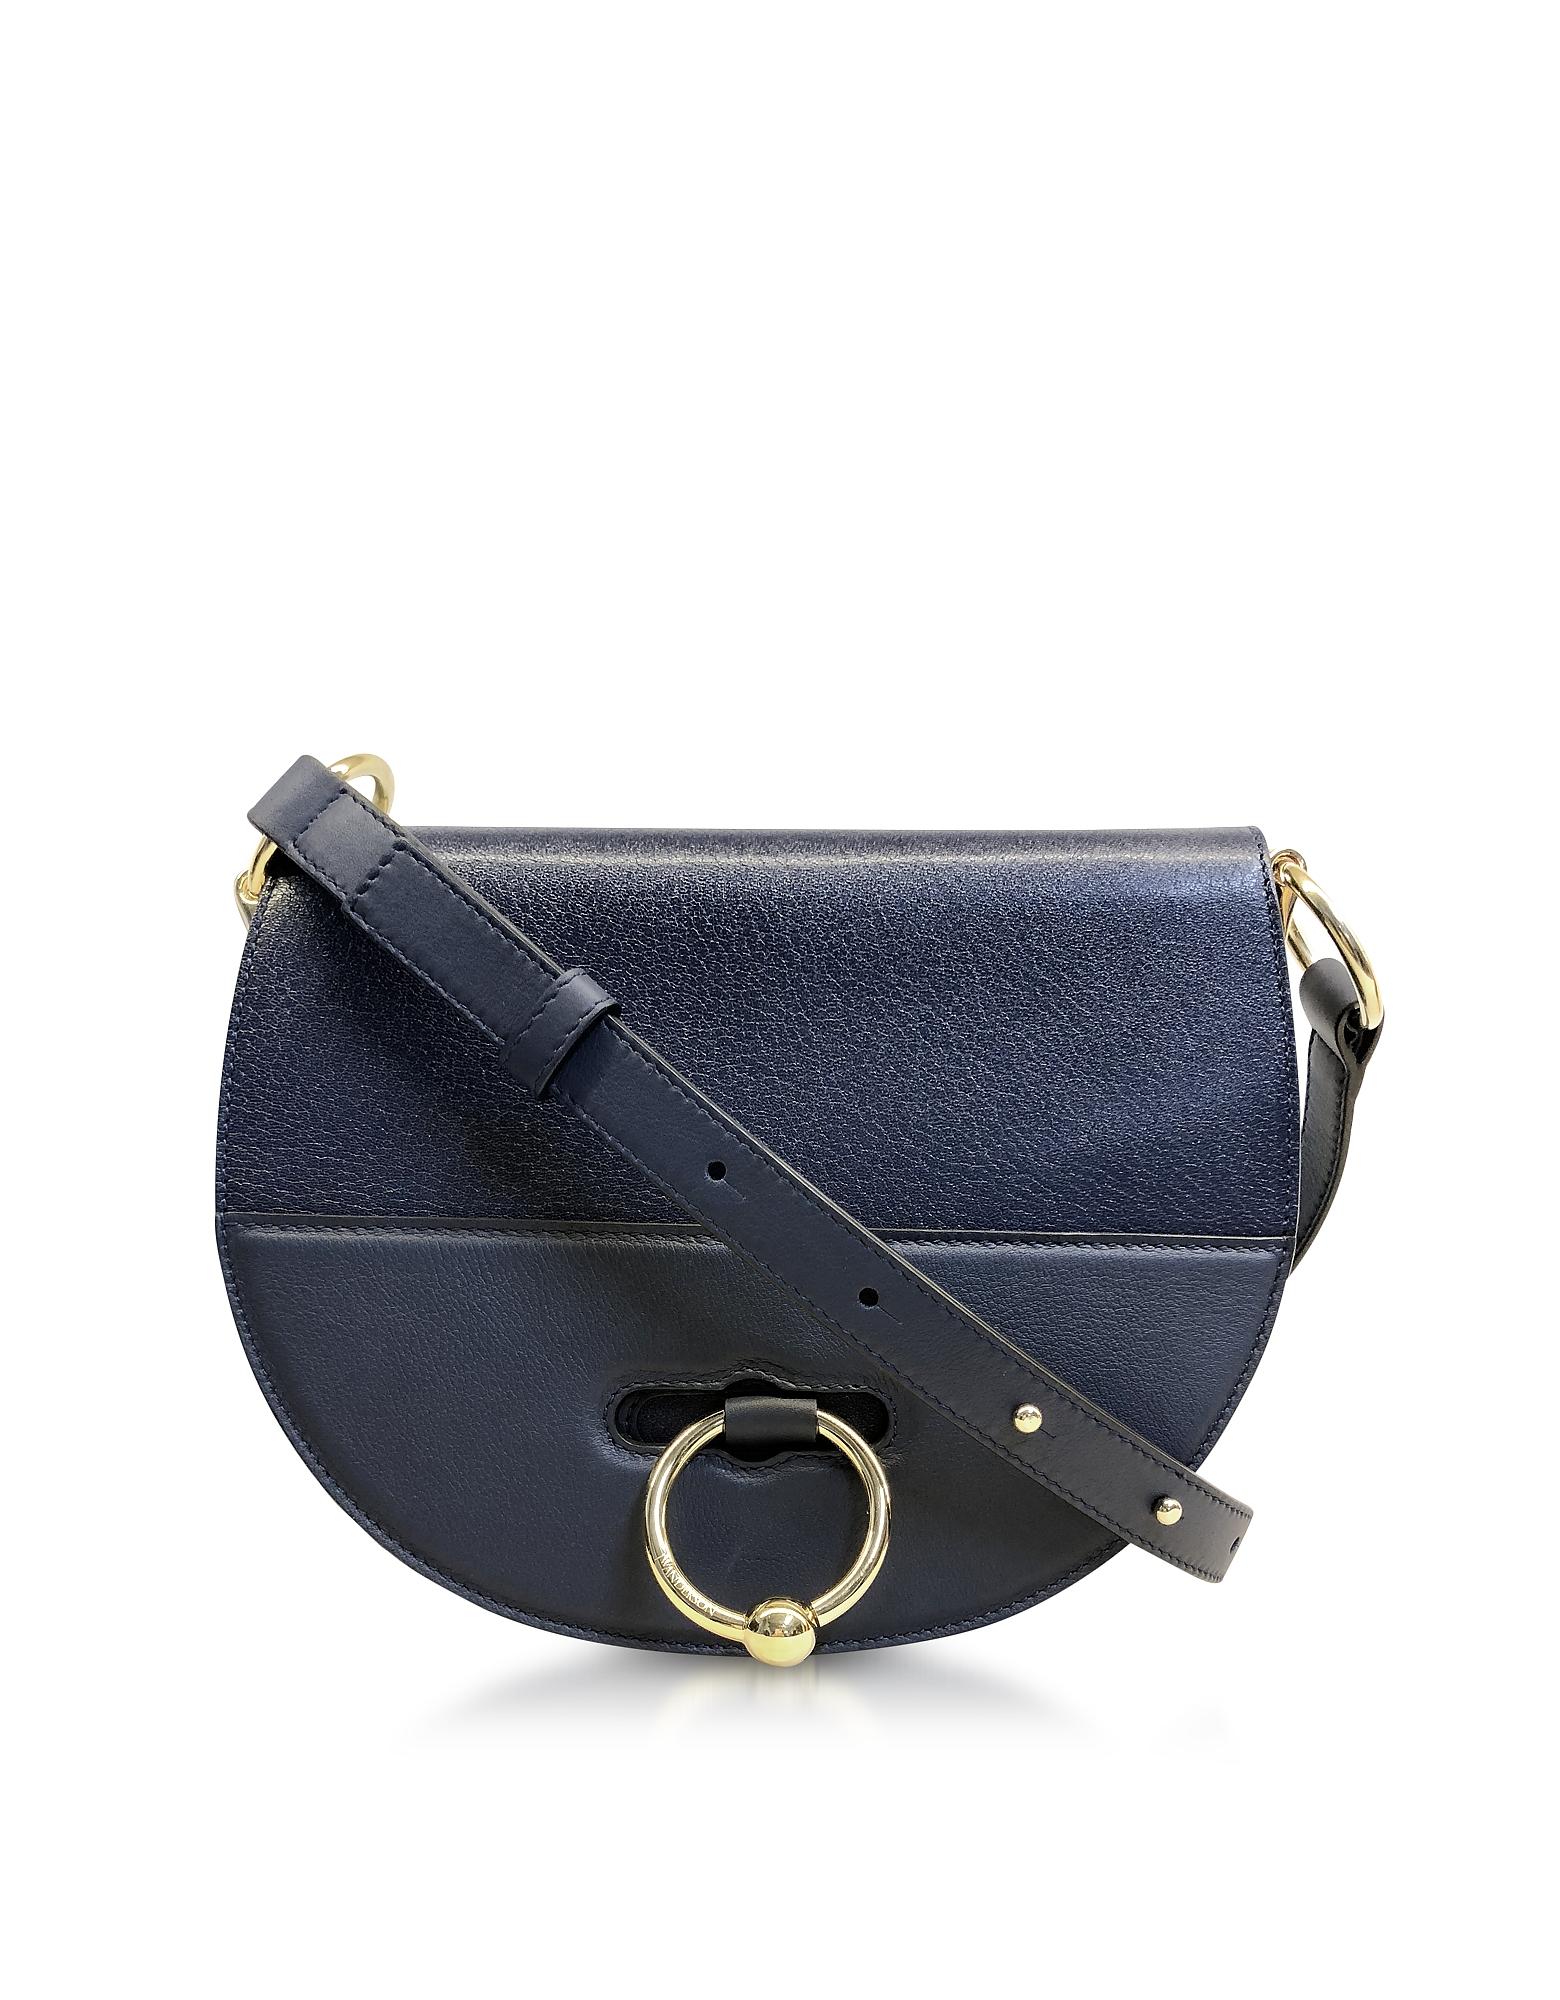 Flap Top Leather Latch Bag w/Shoulder Strap